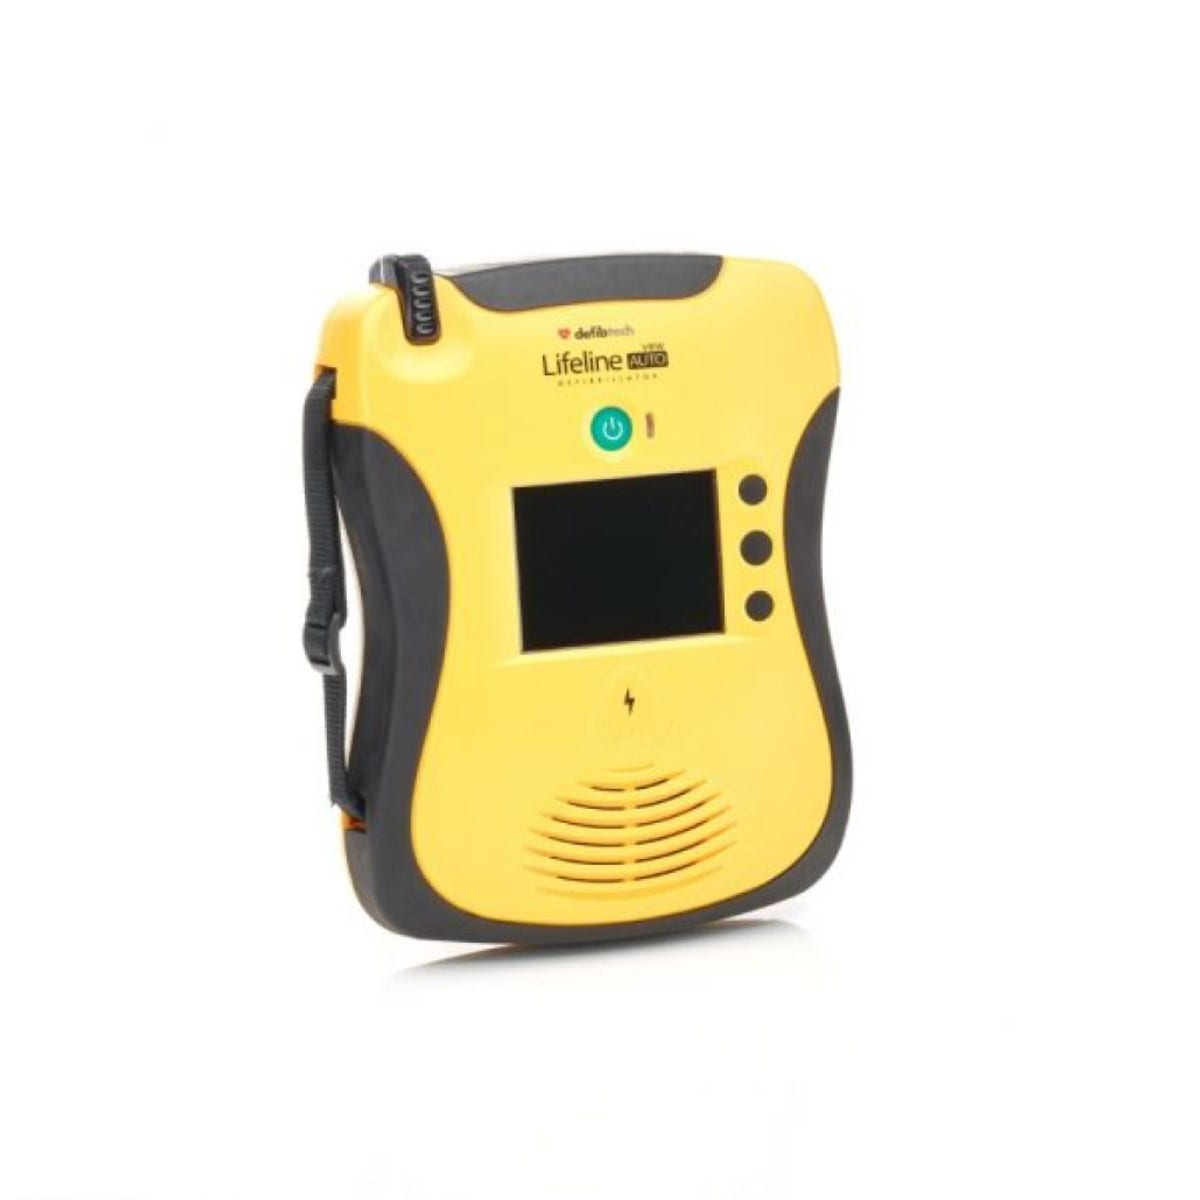 Defibtech Lifeline VIEW AED-Volautomaat-Nederlands-Engels - Janhofman.nl - 1